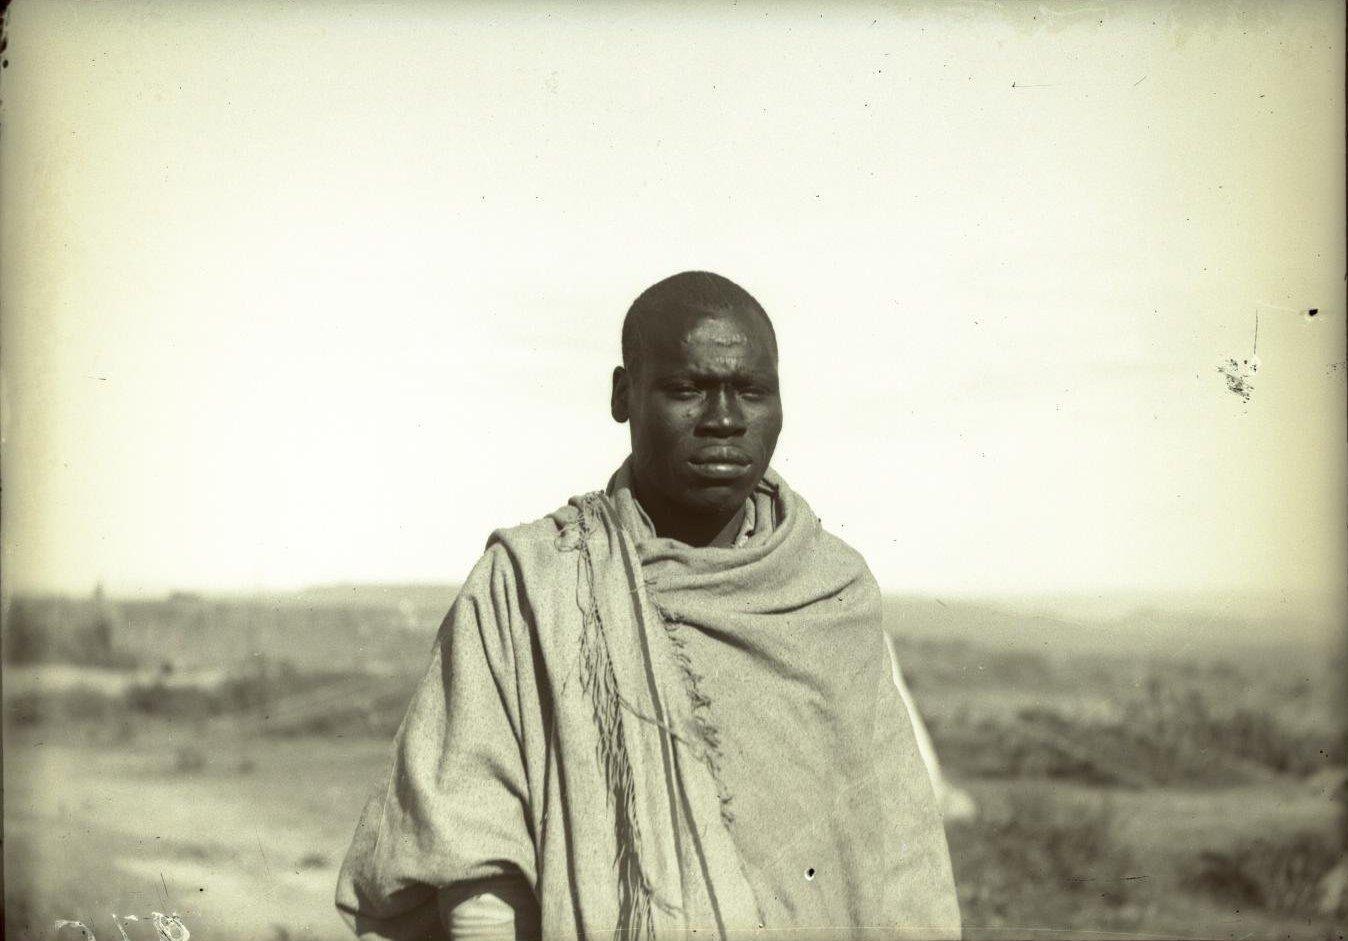 275. Абиссиния, провинция Харар, г. Харар. Тип солдата-шанкала